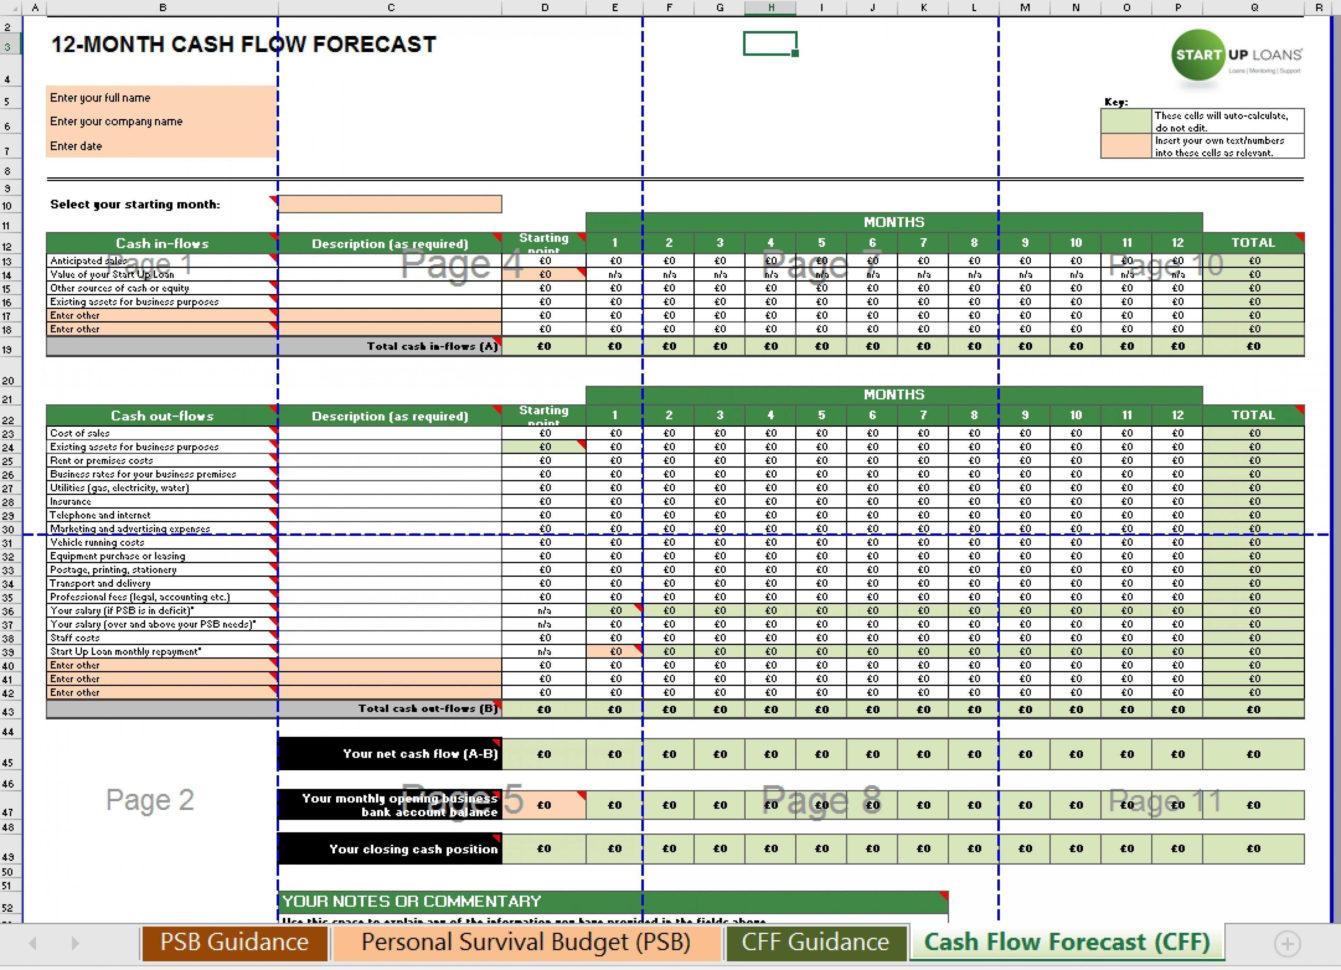 Cash Flow Spreadsheet Template Free Throughout 013 Free Weekly Cash Flow Forecast Template Excel Monthly